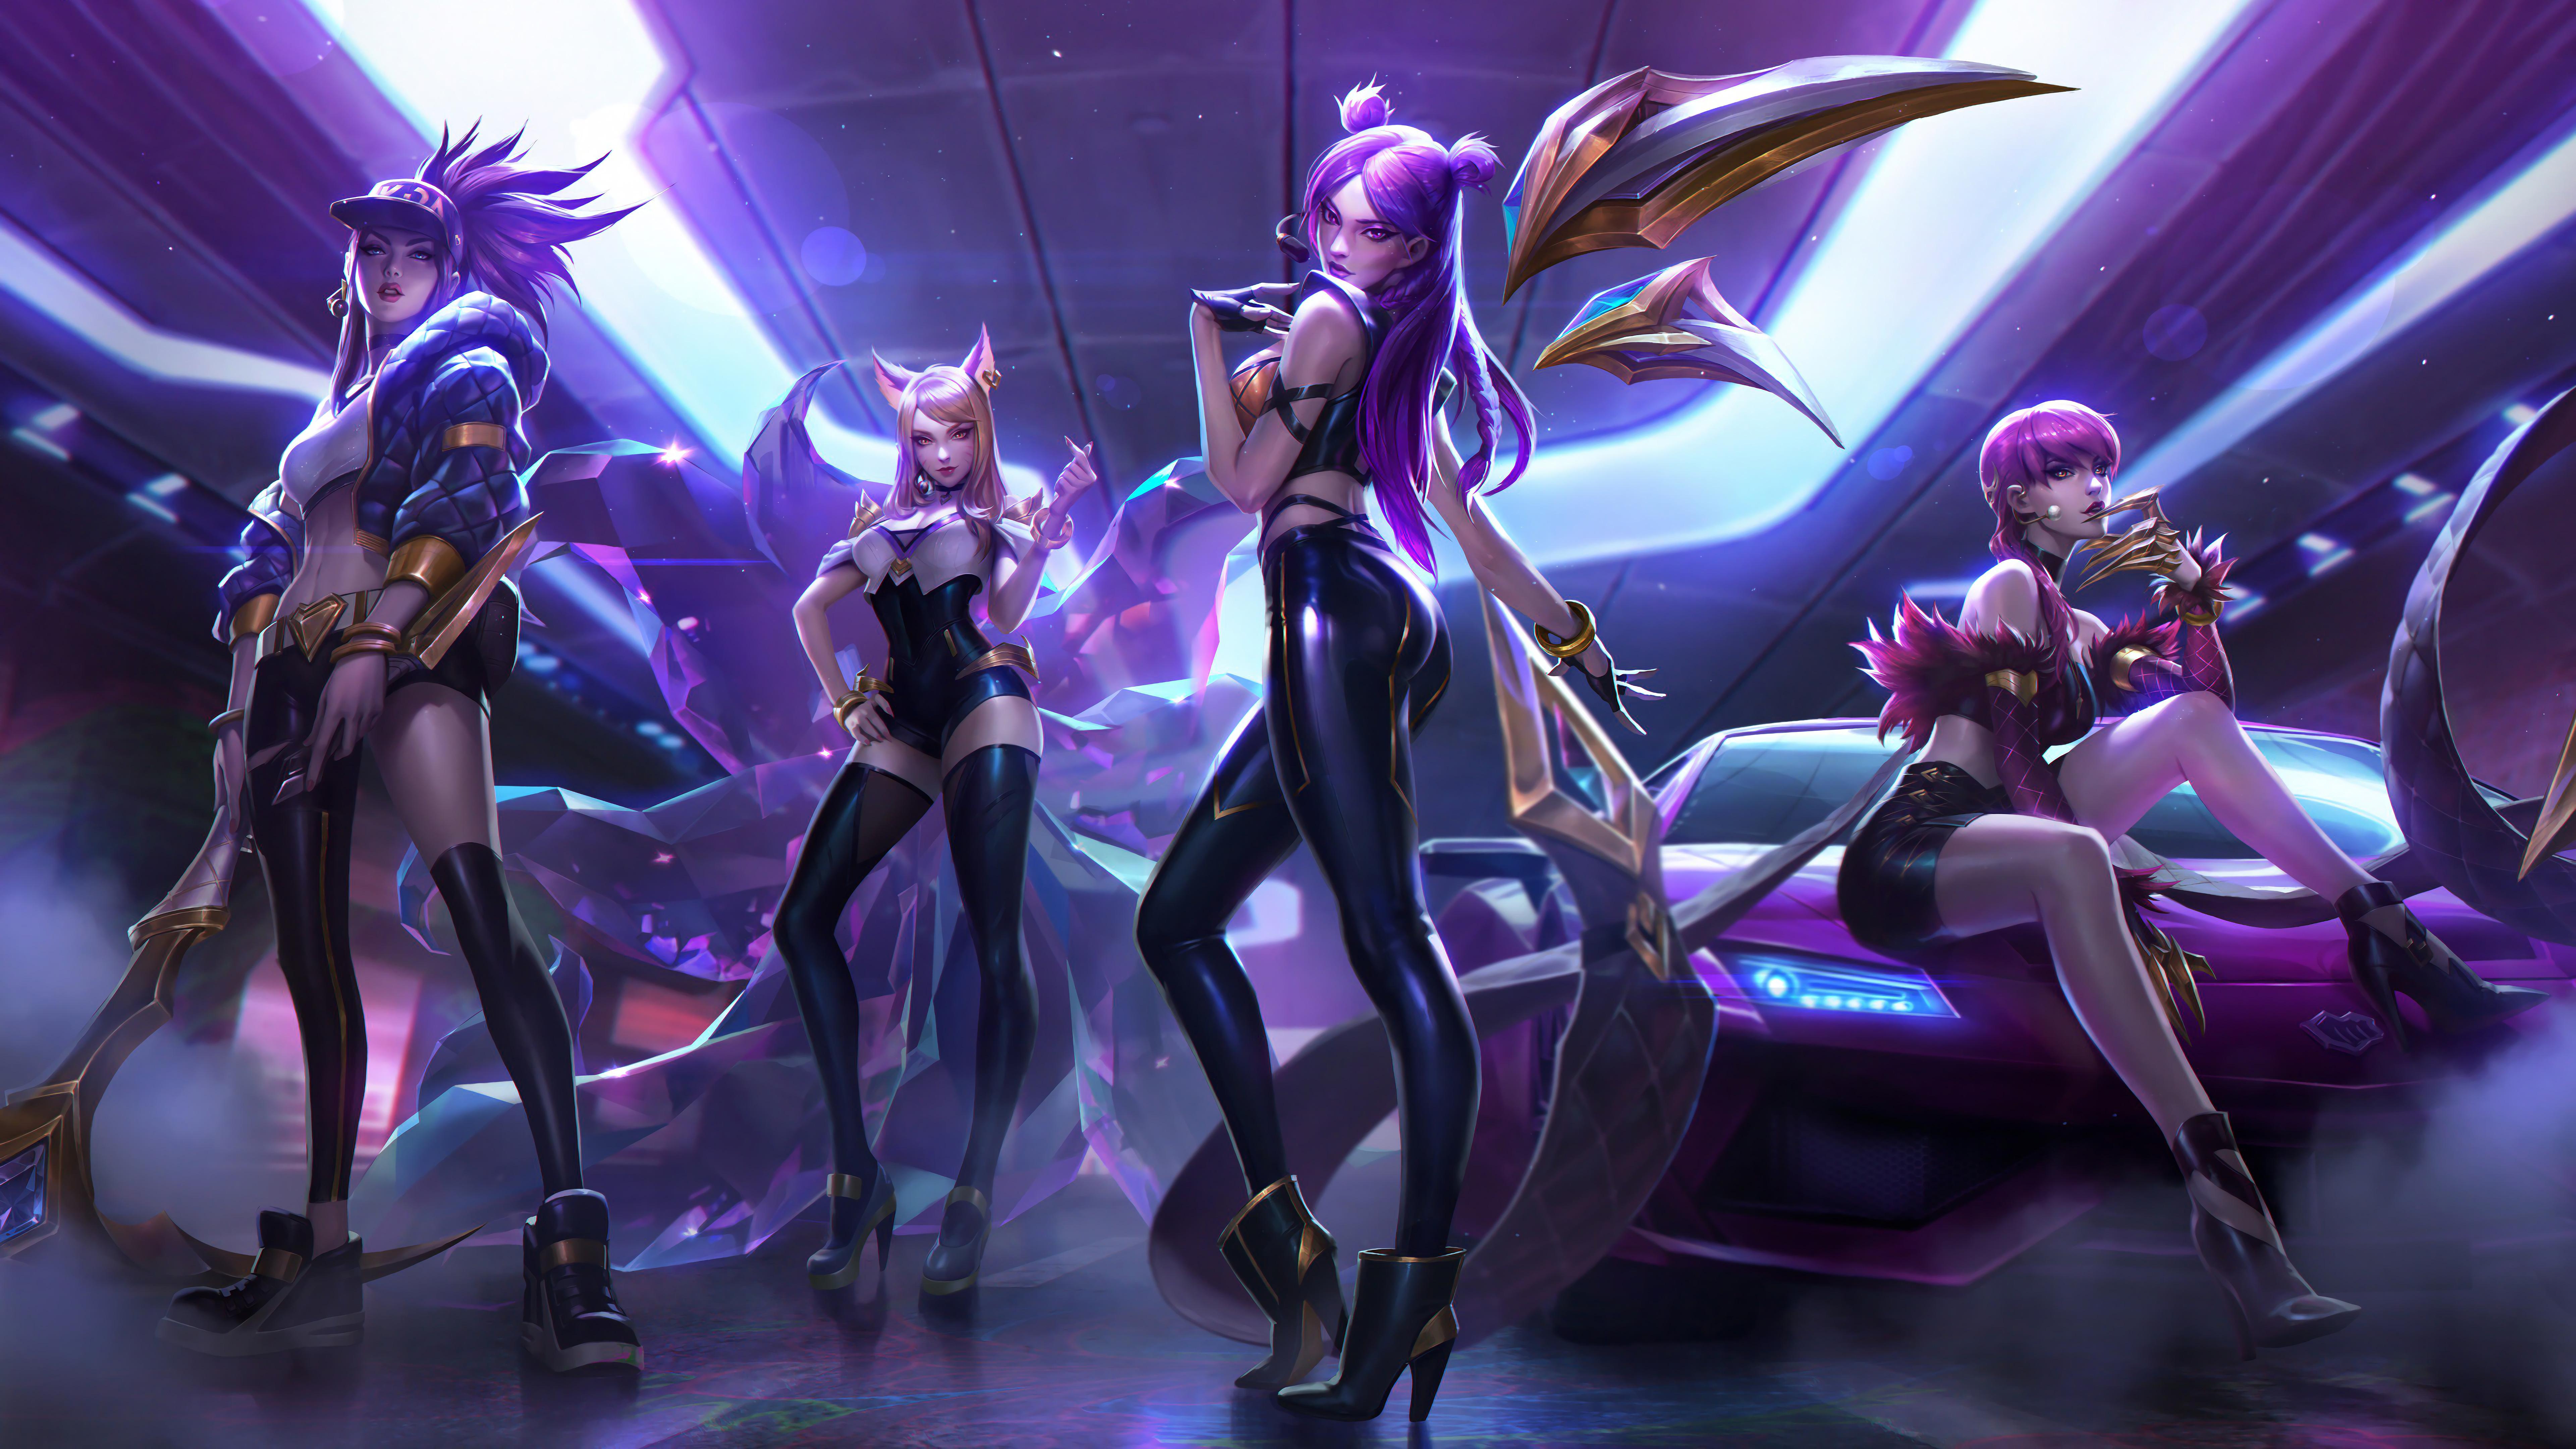 Image: Kai'sa, posture, car, four, League of Legends, game